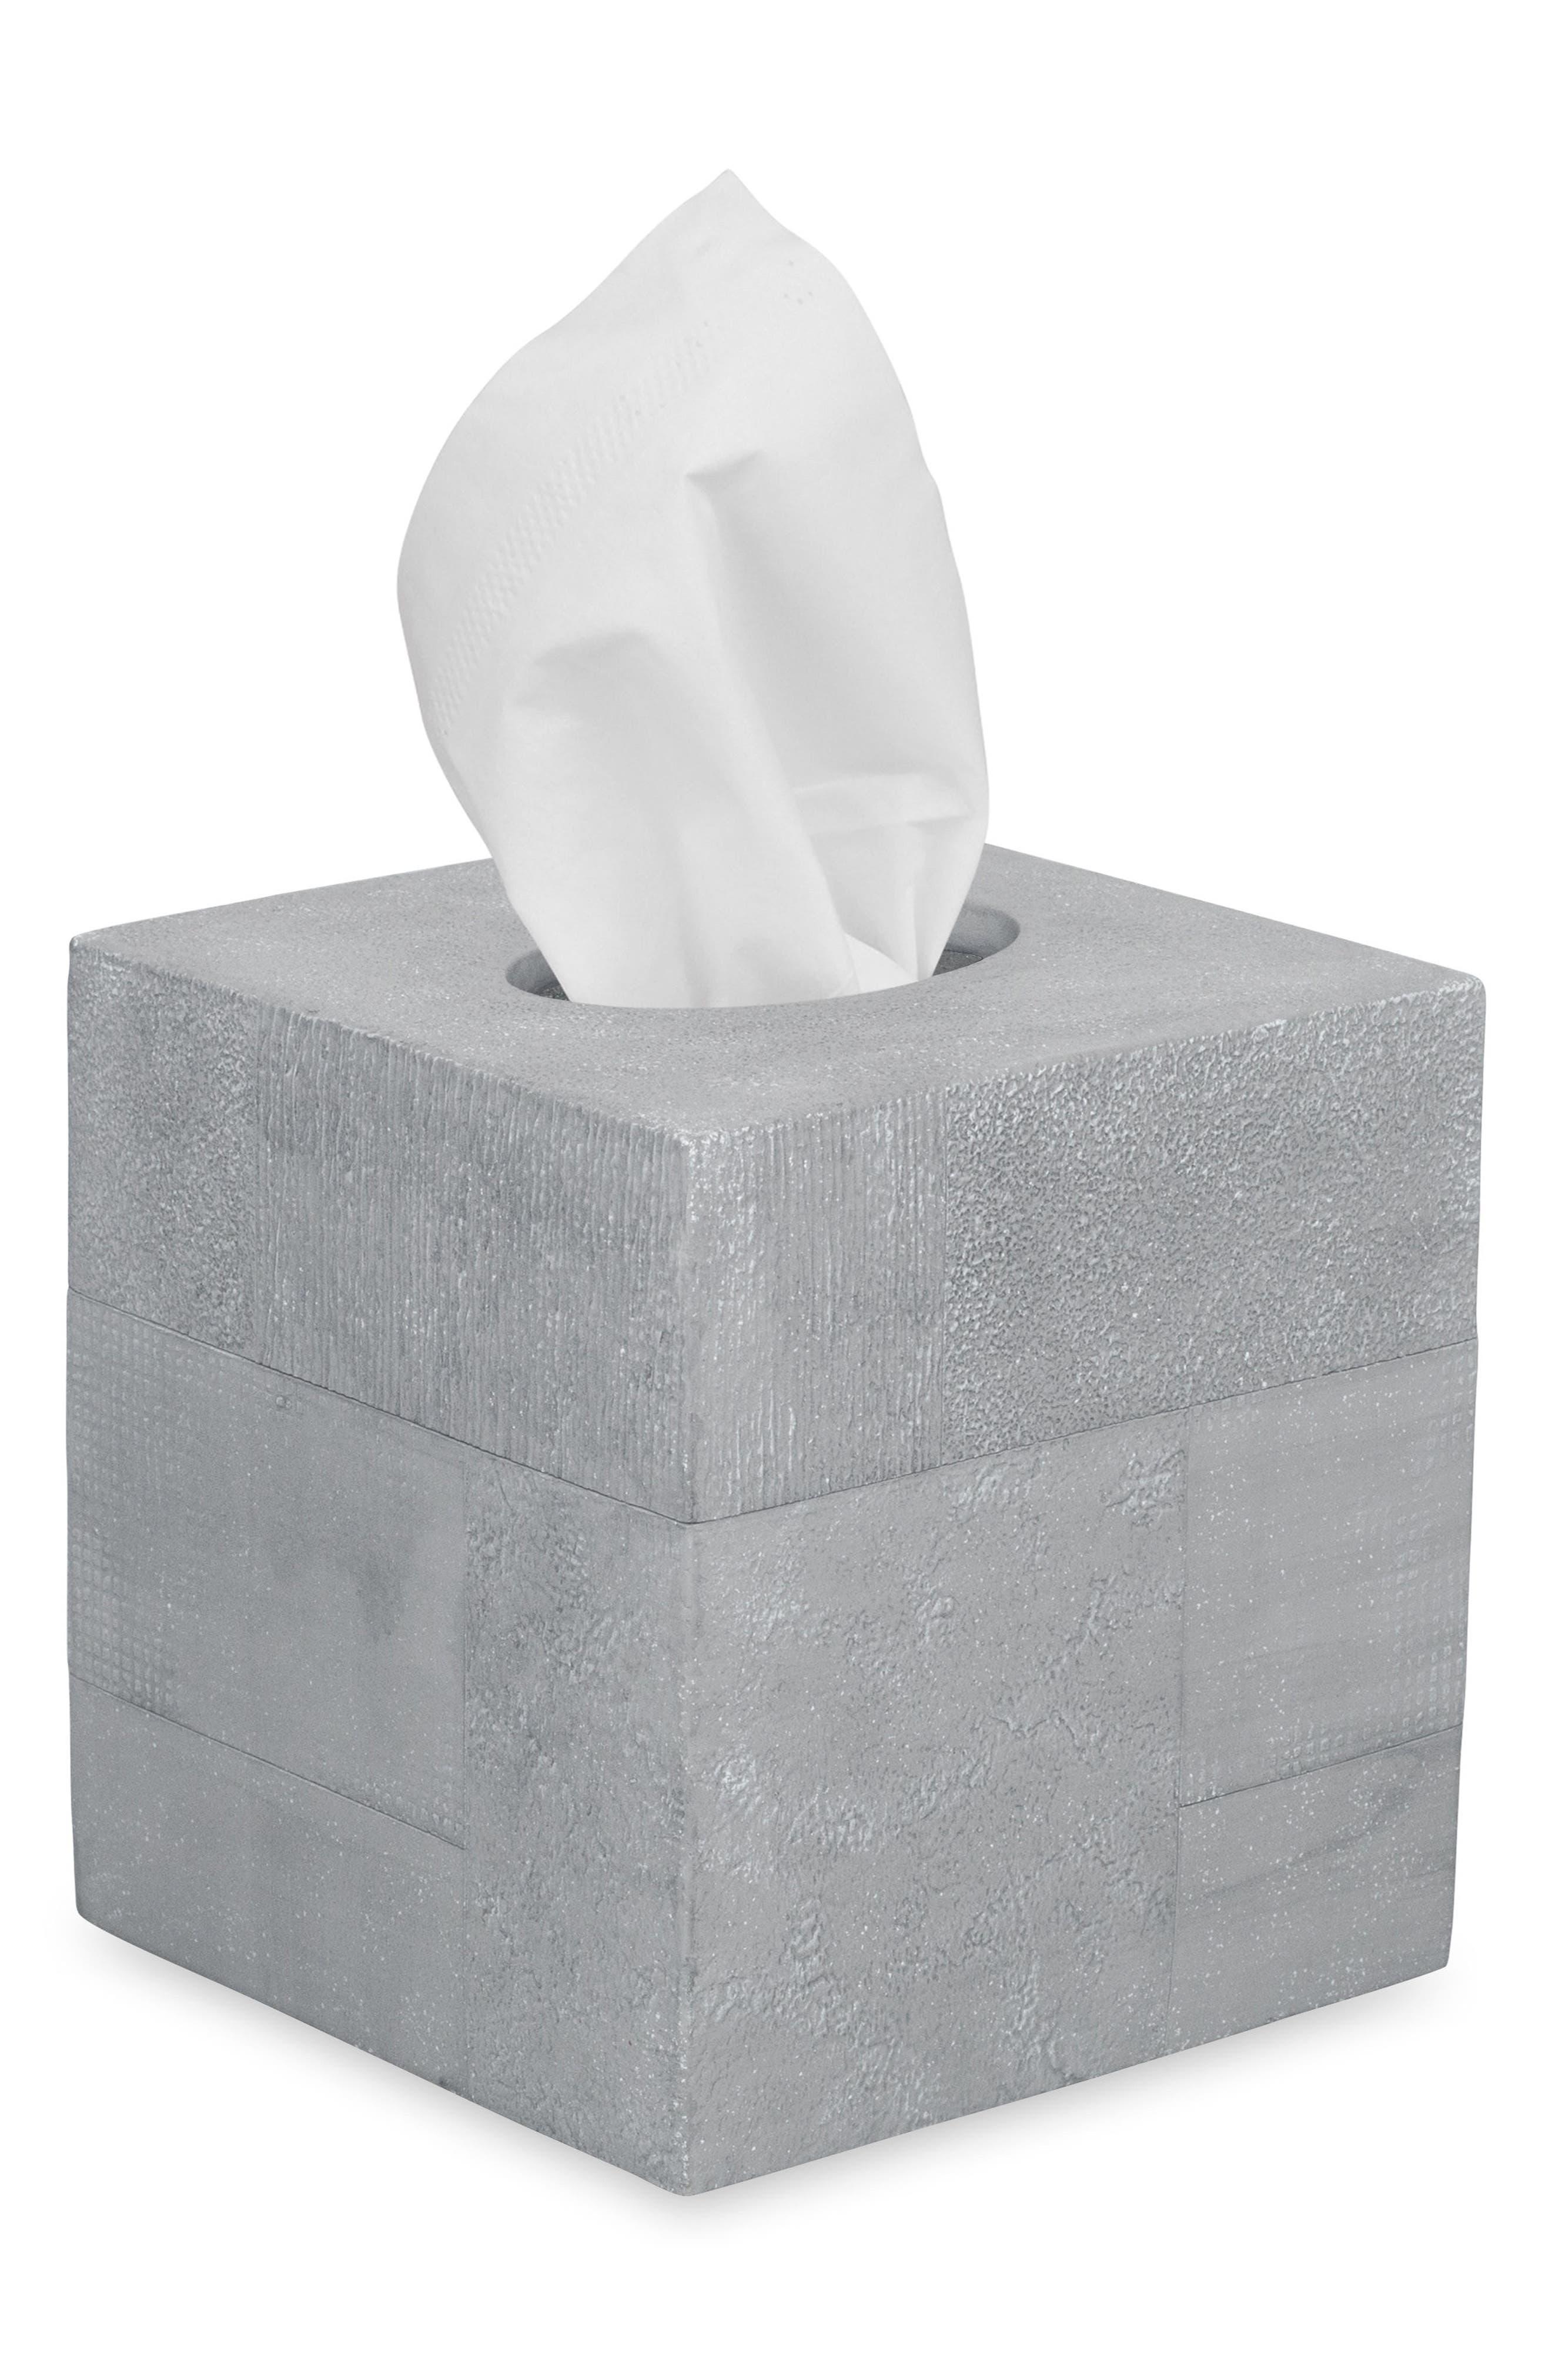 DKNY Cornerstone Tissue Box Cover